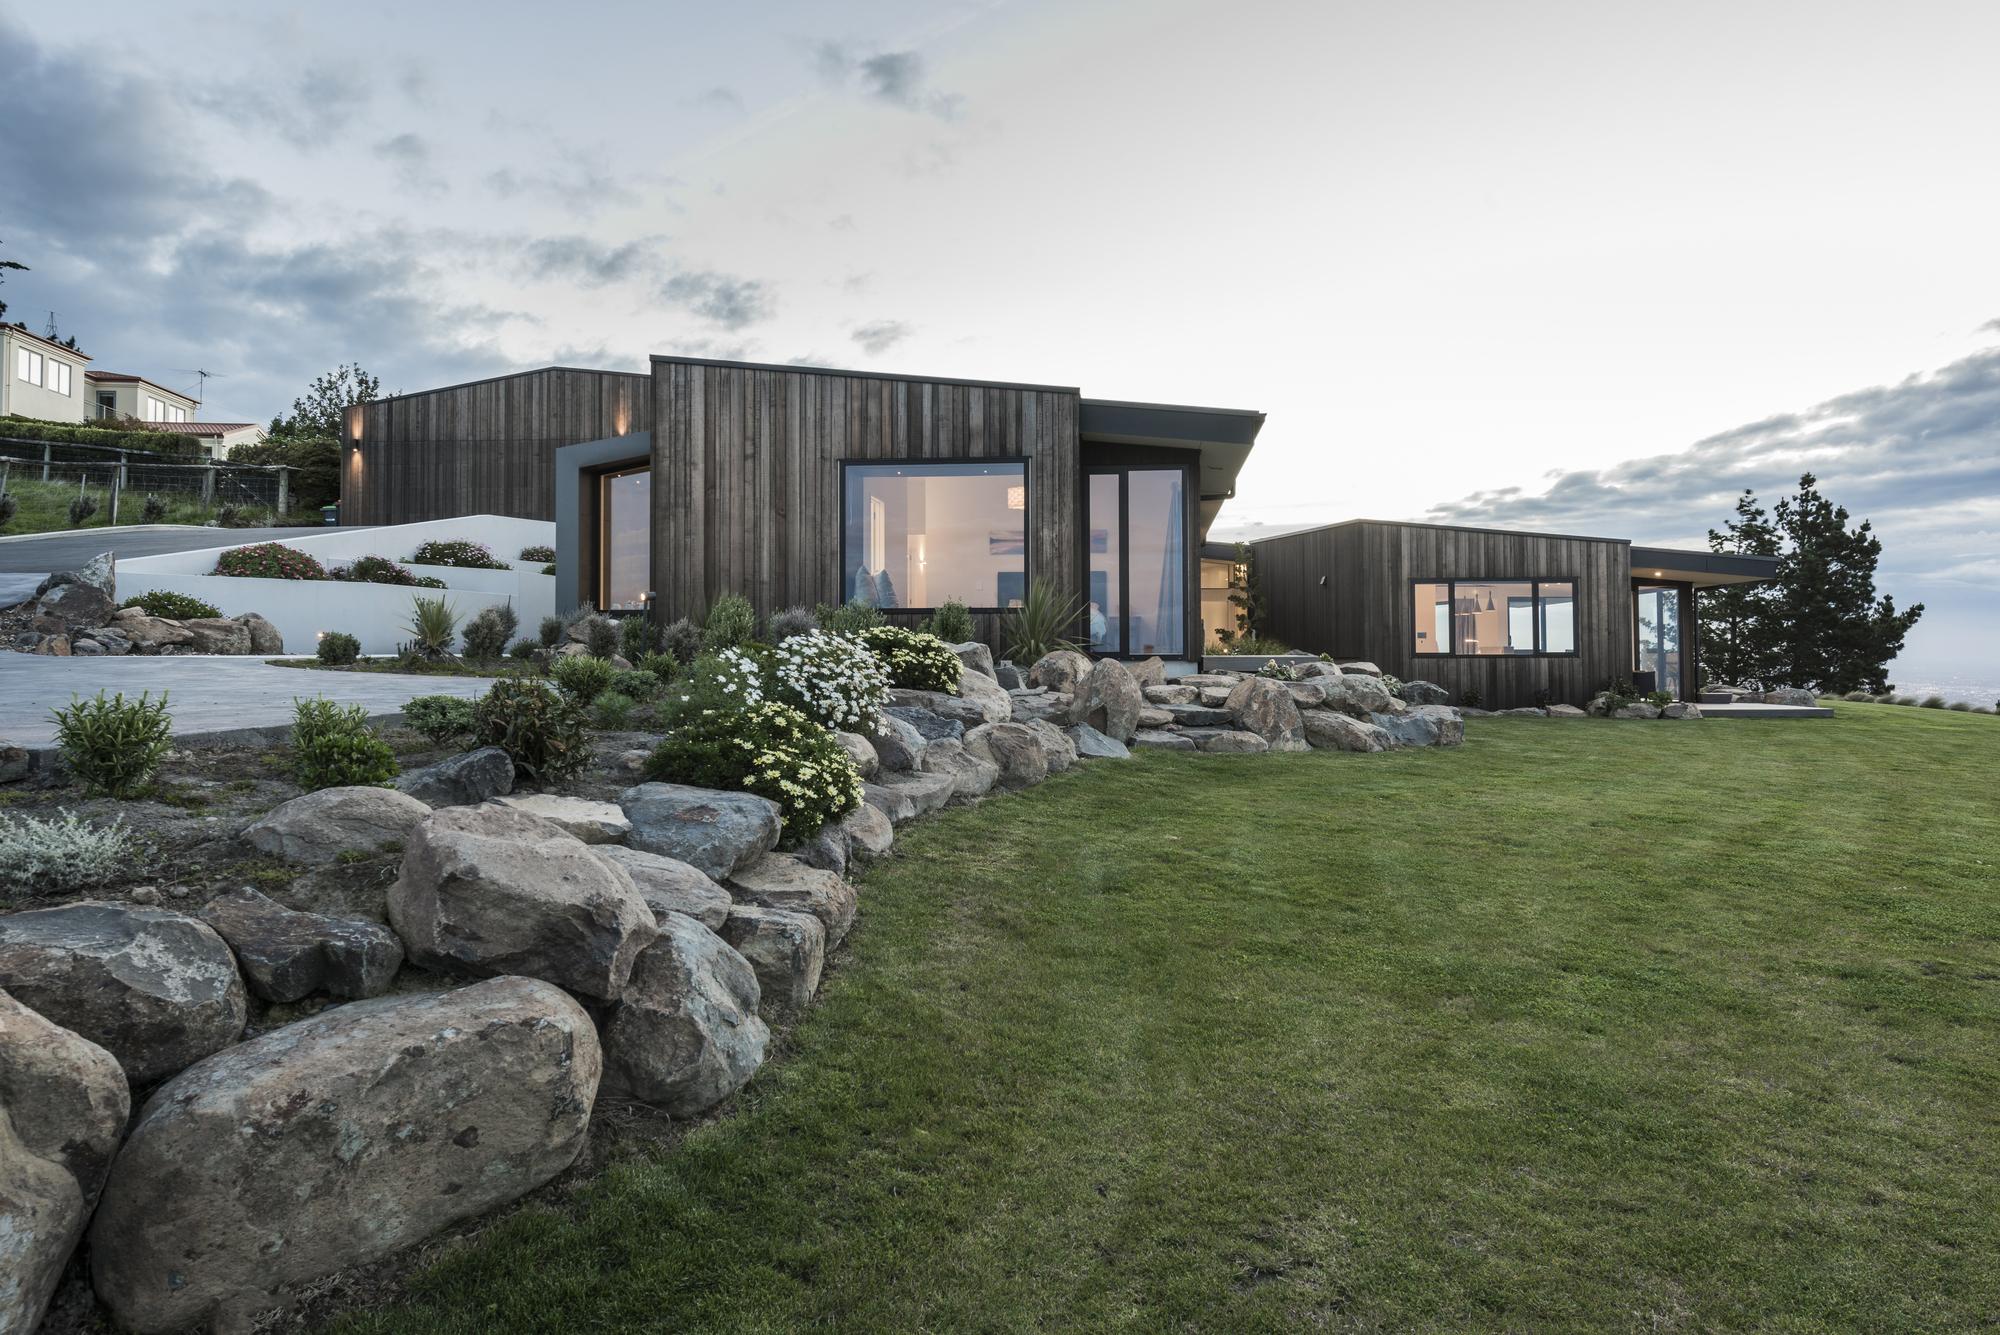 Mt pleasant home cymon allfrey architects stephen goodenough